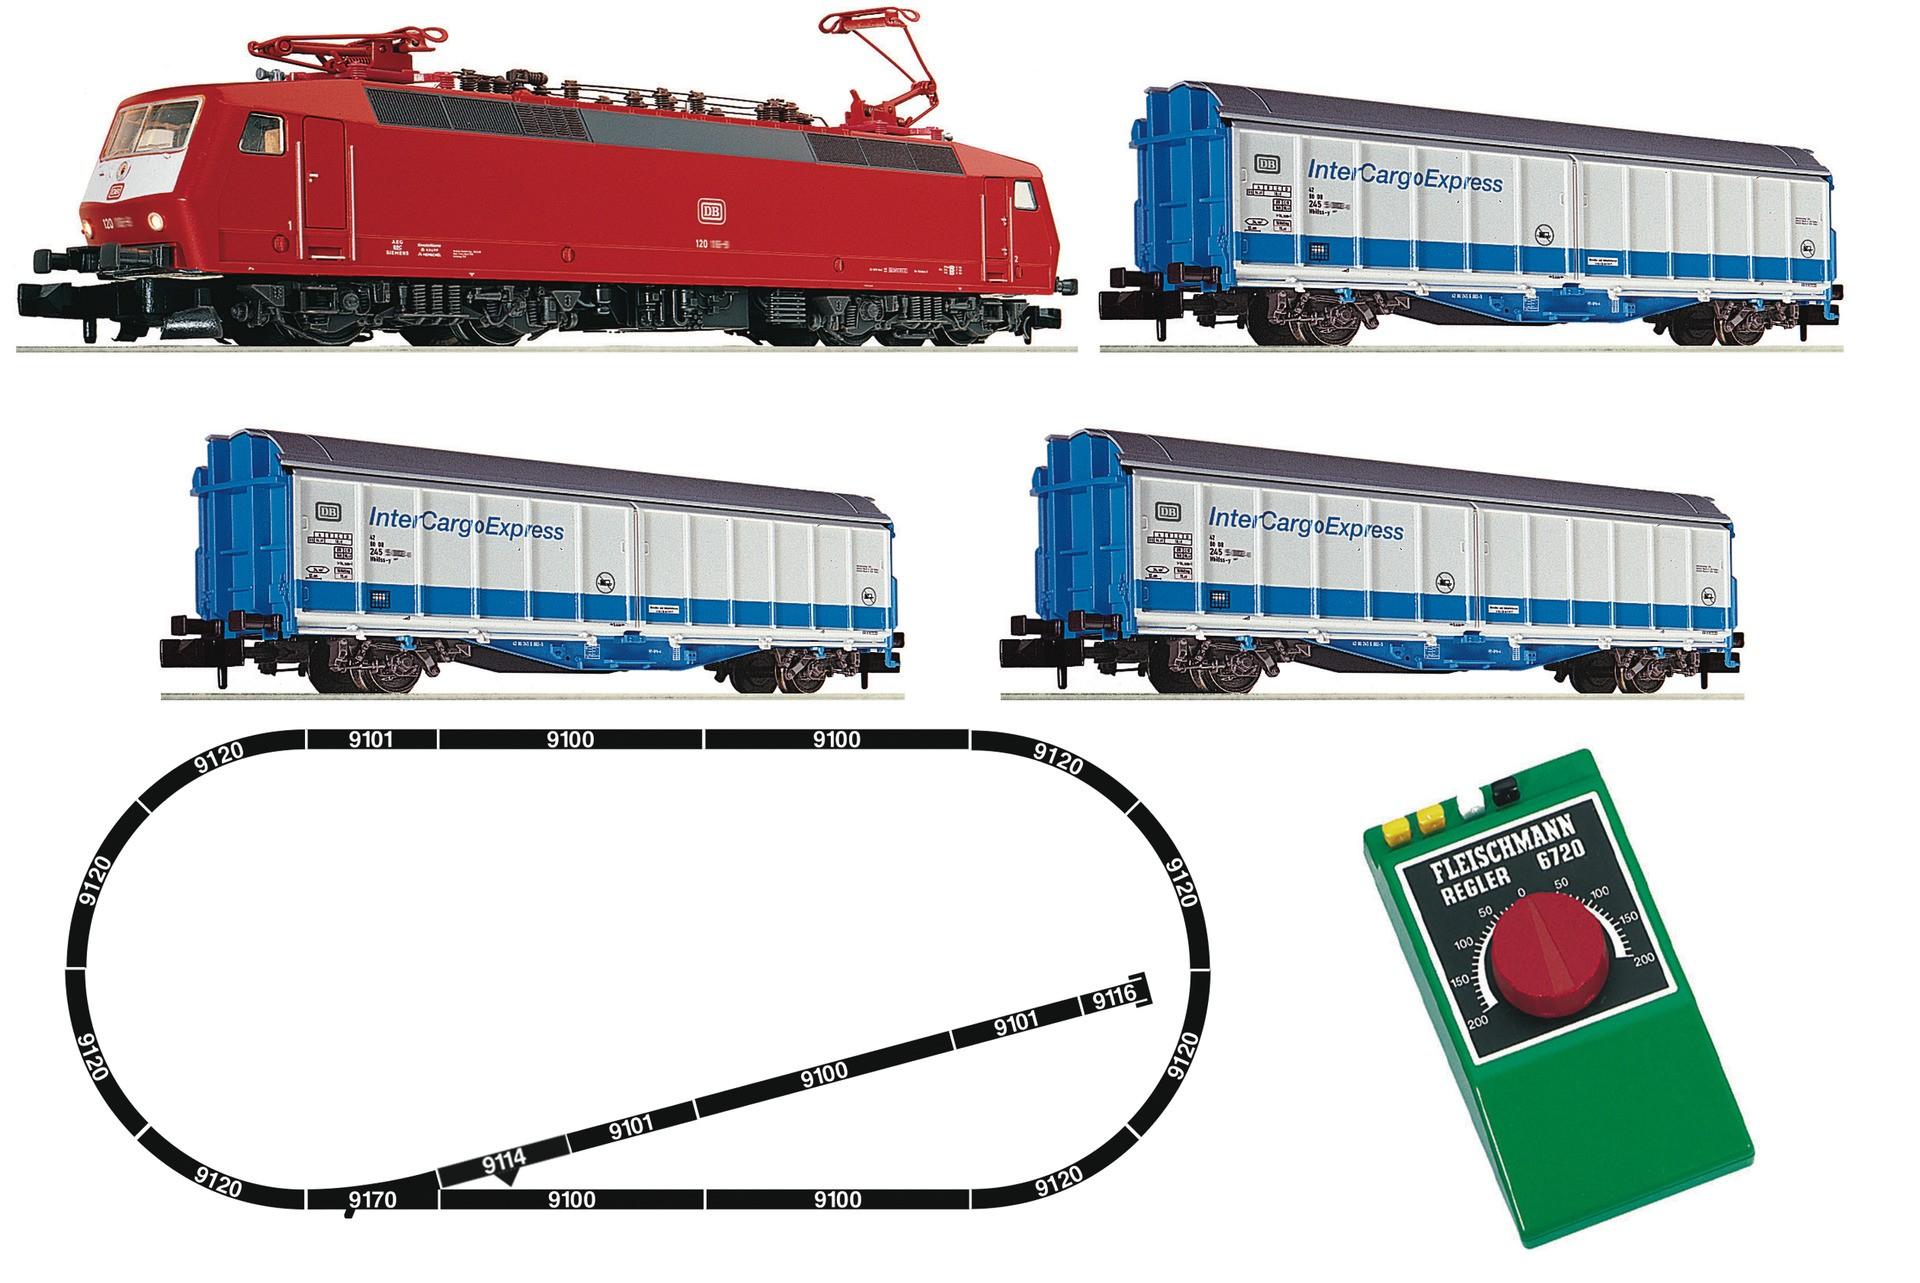 roco, fleischmann, starter-set, intercargoexpress ,                                                                                                                                                                                                                                                                                                                                                                                                                                                                                                                                                                                                                                                                                                                                                                                                                                                                                                                                                                                                                                                                                                                                                                                                                                                                                                                                                    DB 120 sorozatú villamos mozdony